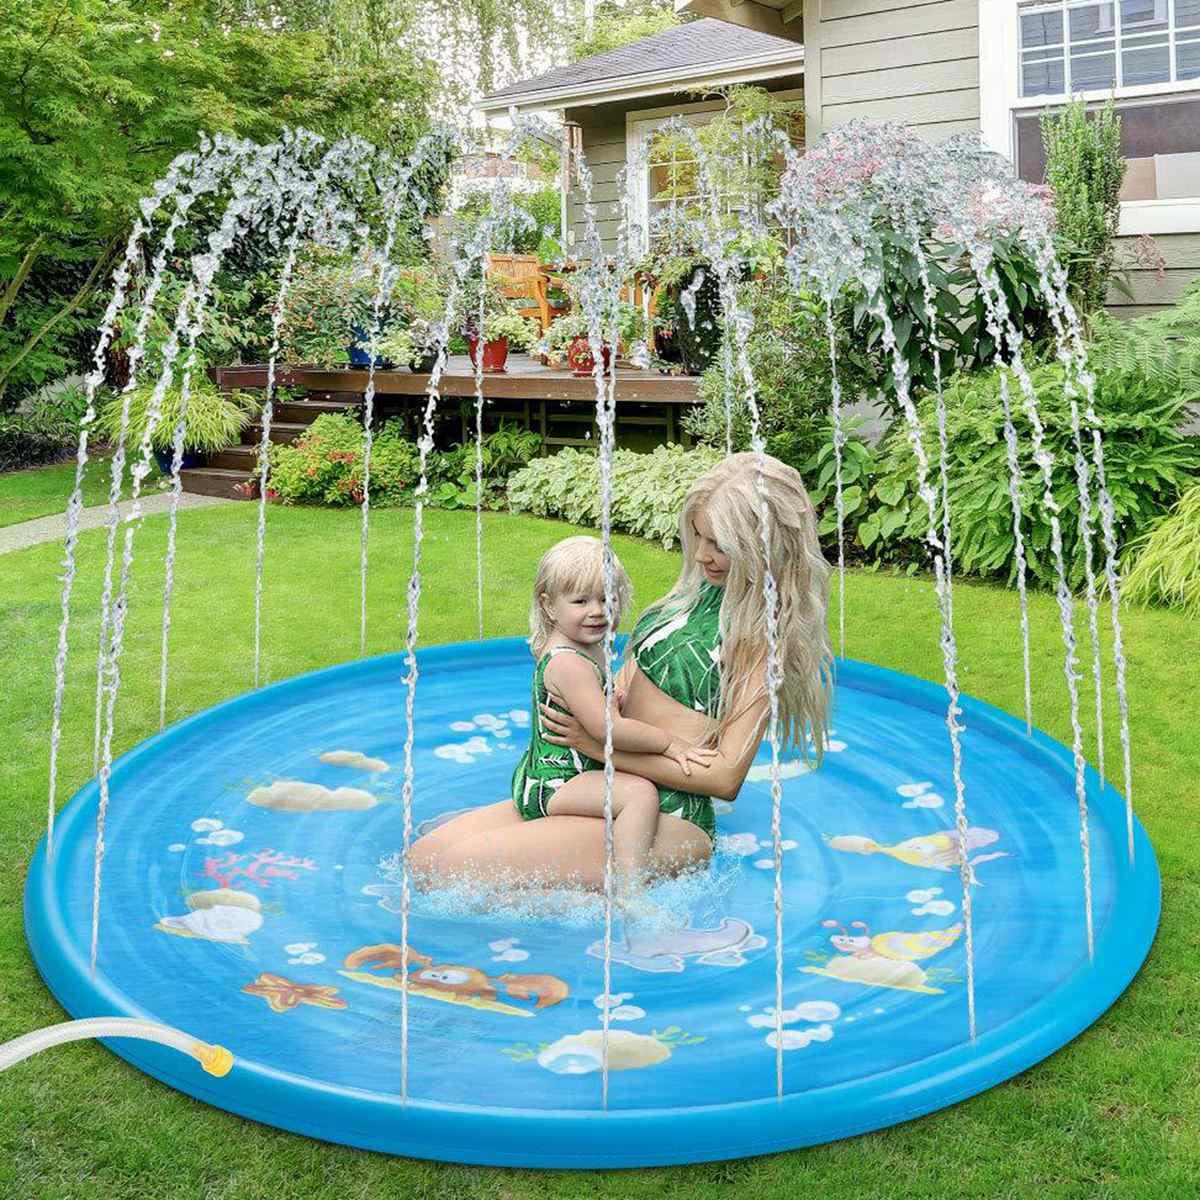 Outdoor Inflatable Sprinkle Splash Mat Baby Kid Play Garden Water Spray Toy Pool